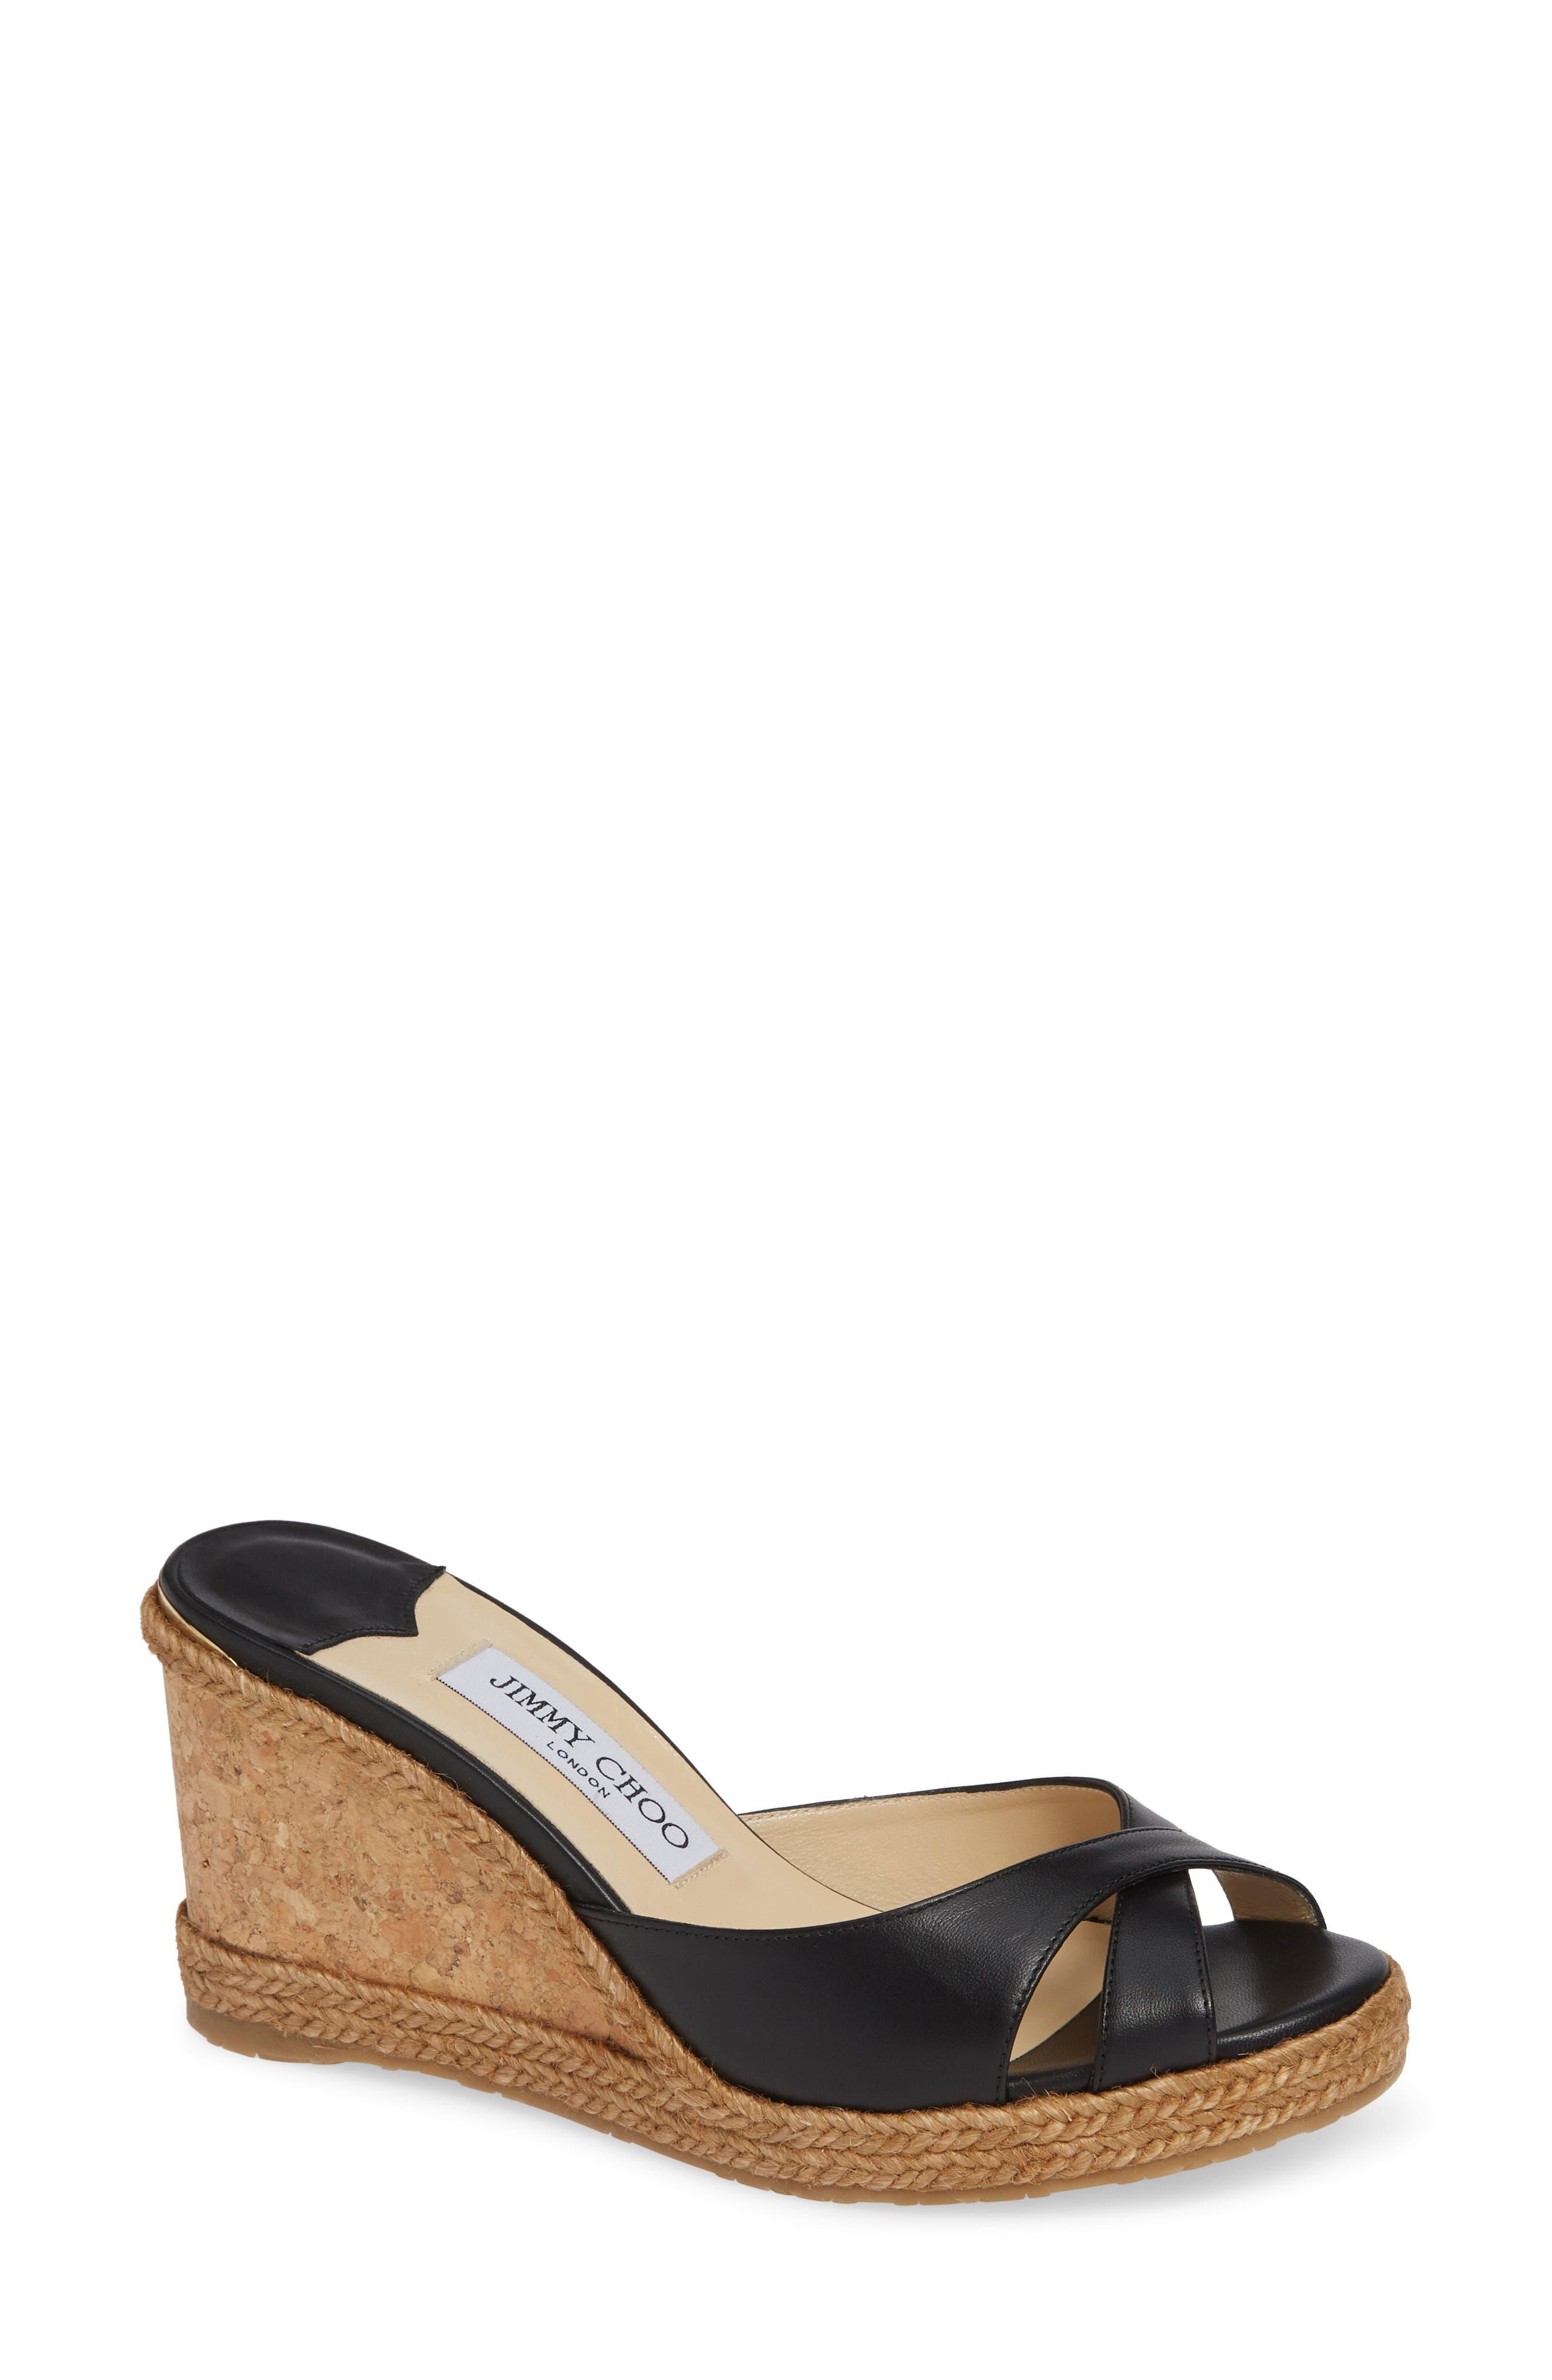 JIMMY CHOO Almer Cork Wedge Sandal, Main, color, BLACK